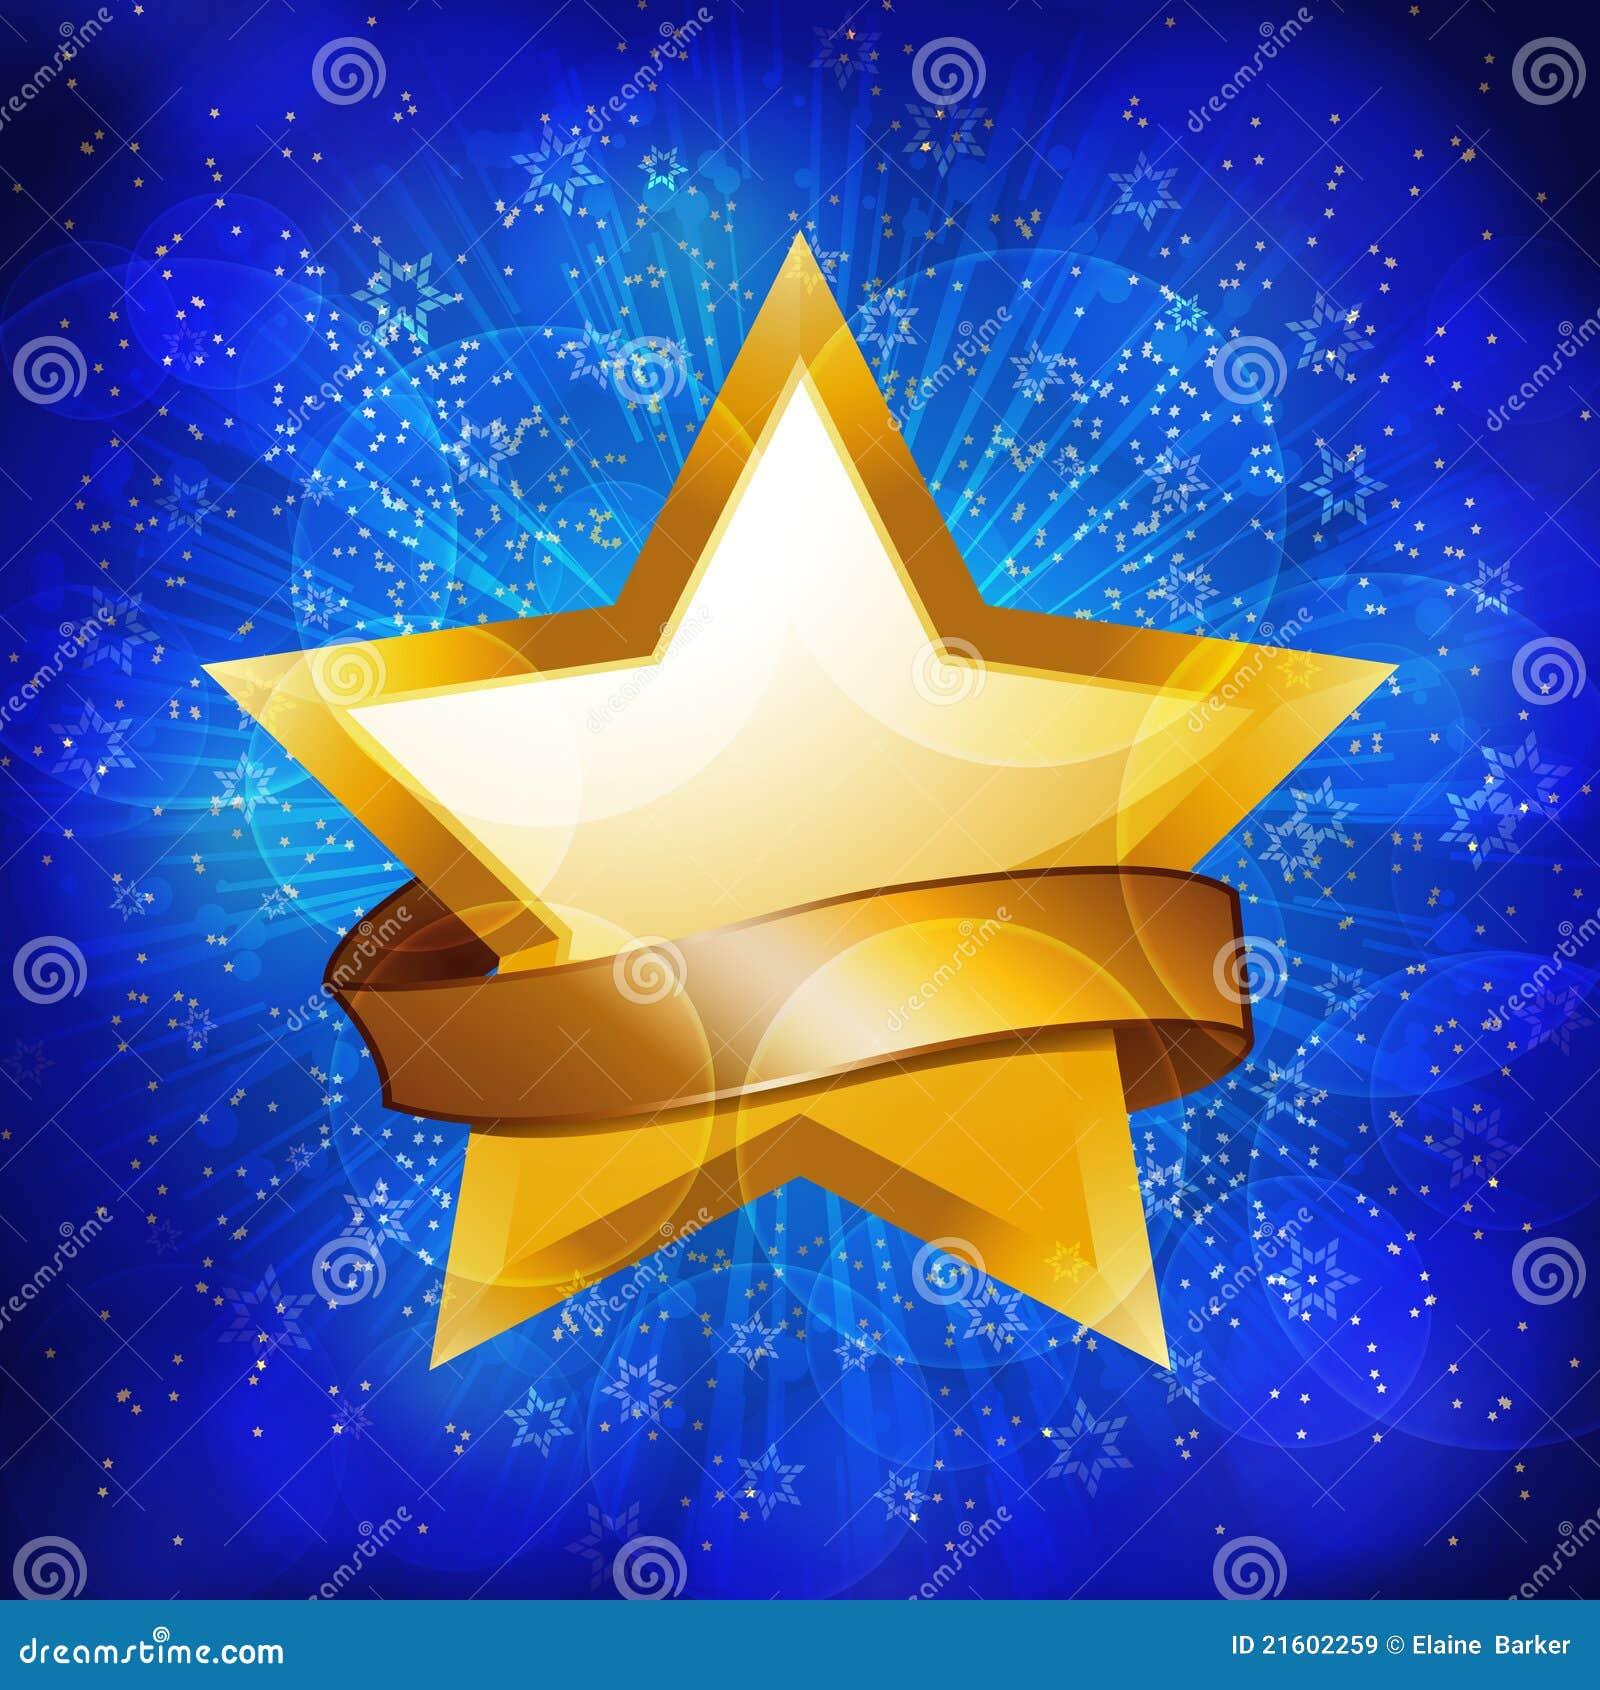 gold celebration star background royalty free stock images